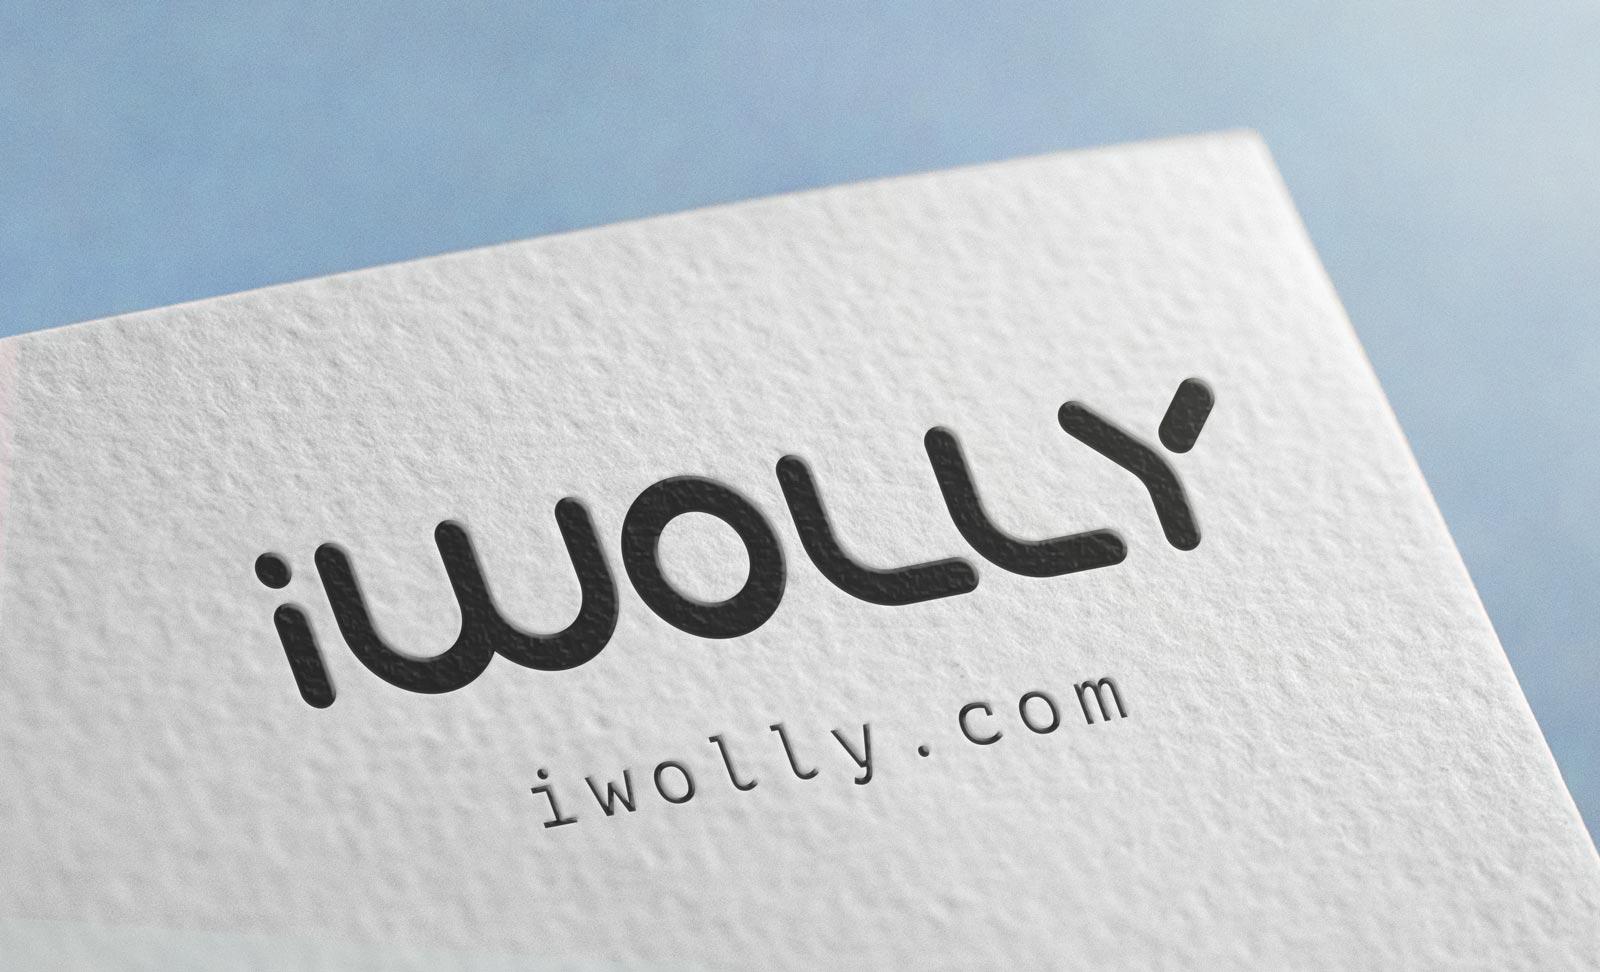 iWolly – Branding